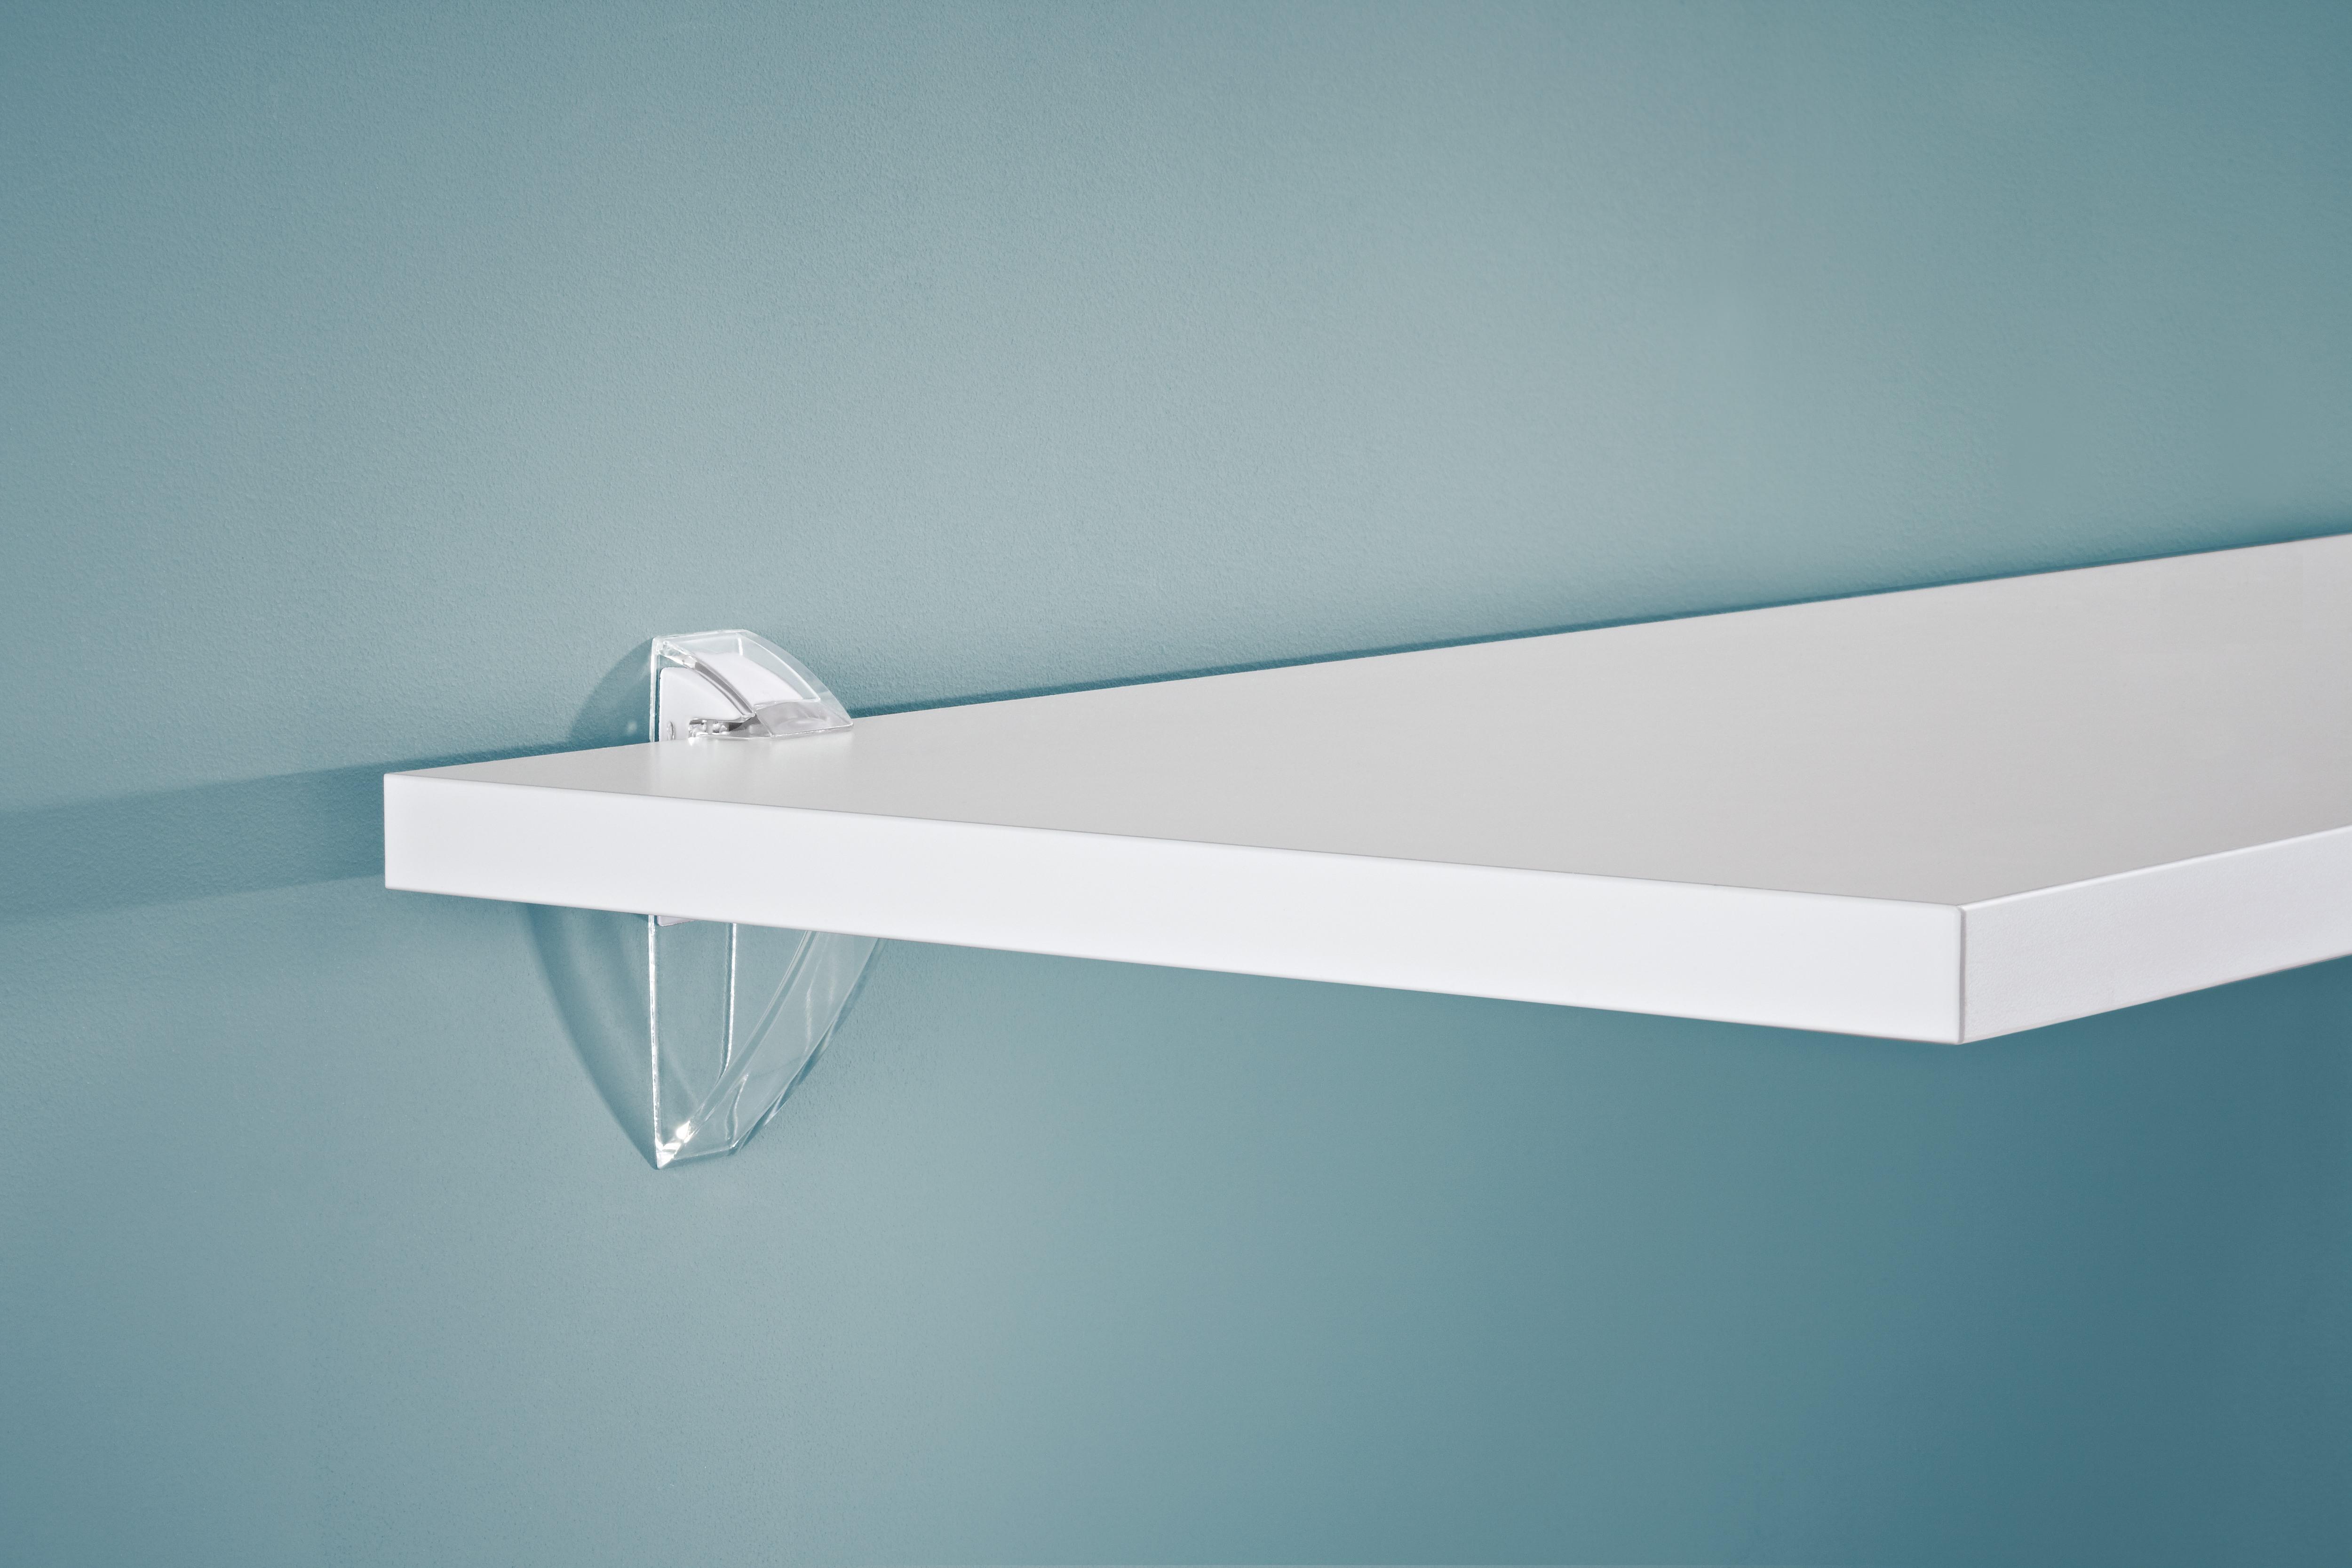 Transparent 19mm Clips Pair Topshelf